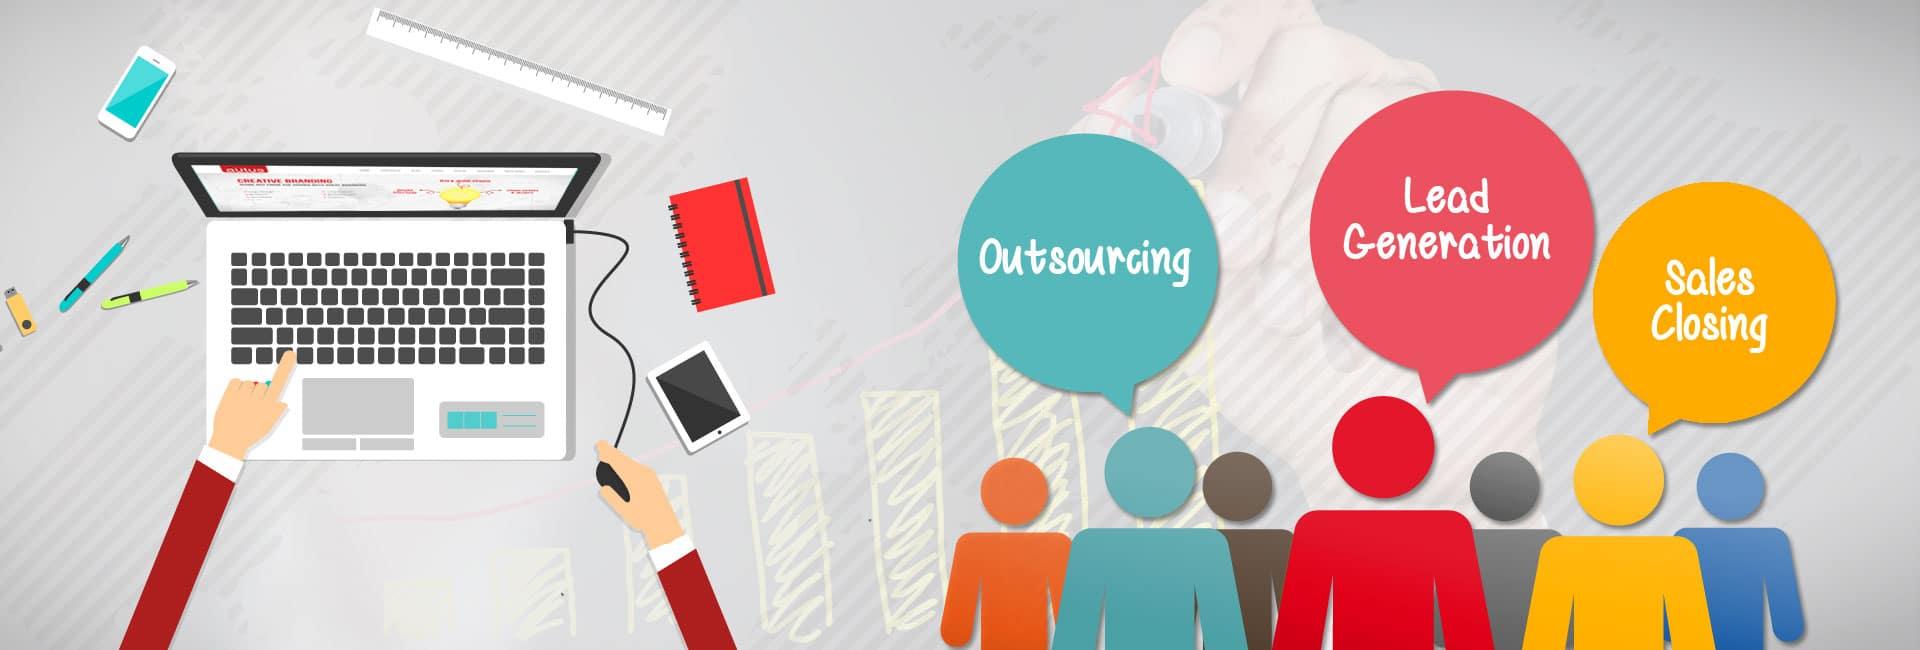 Online Marketing Pennsauken Township